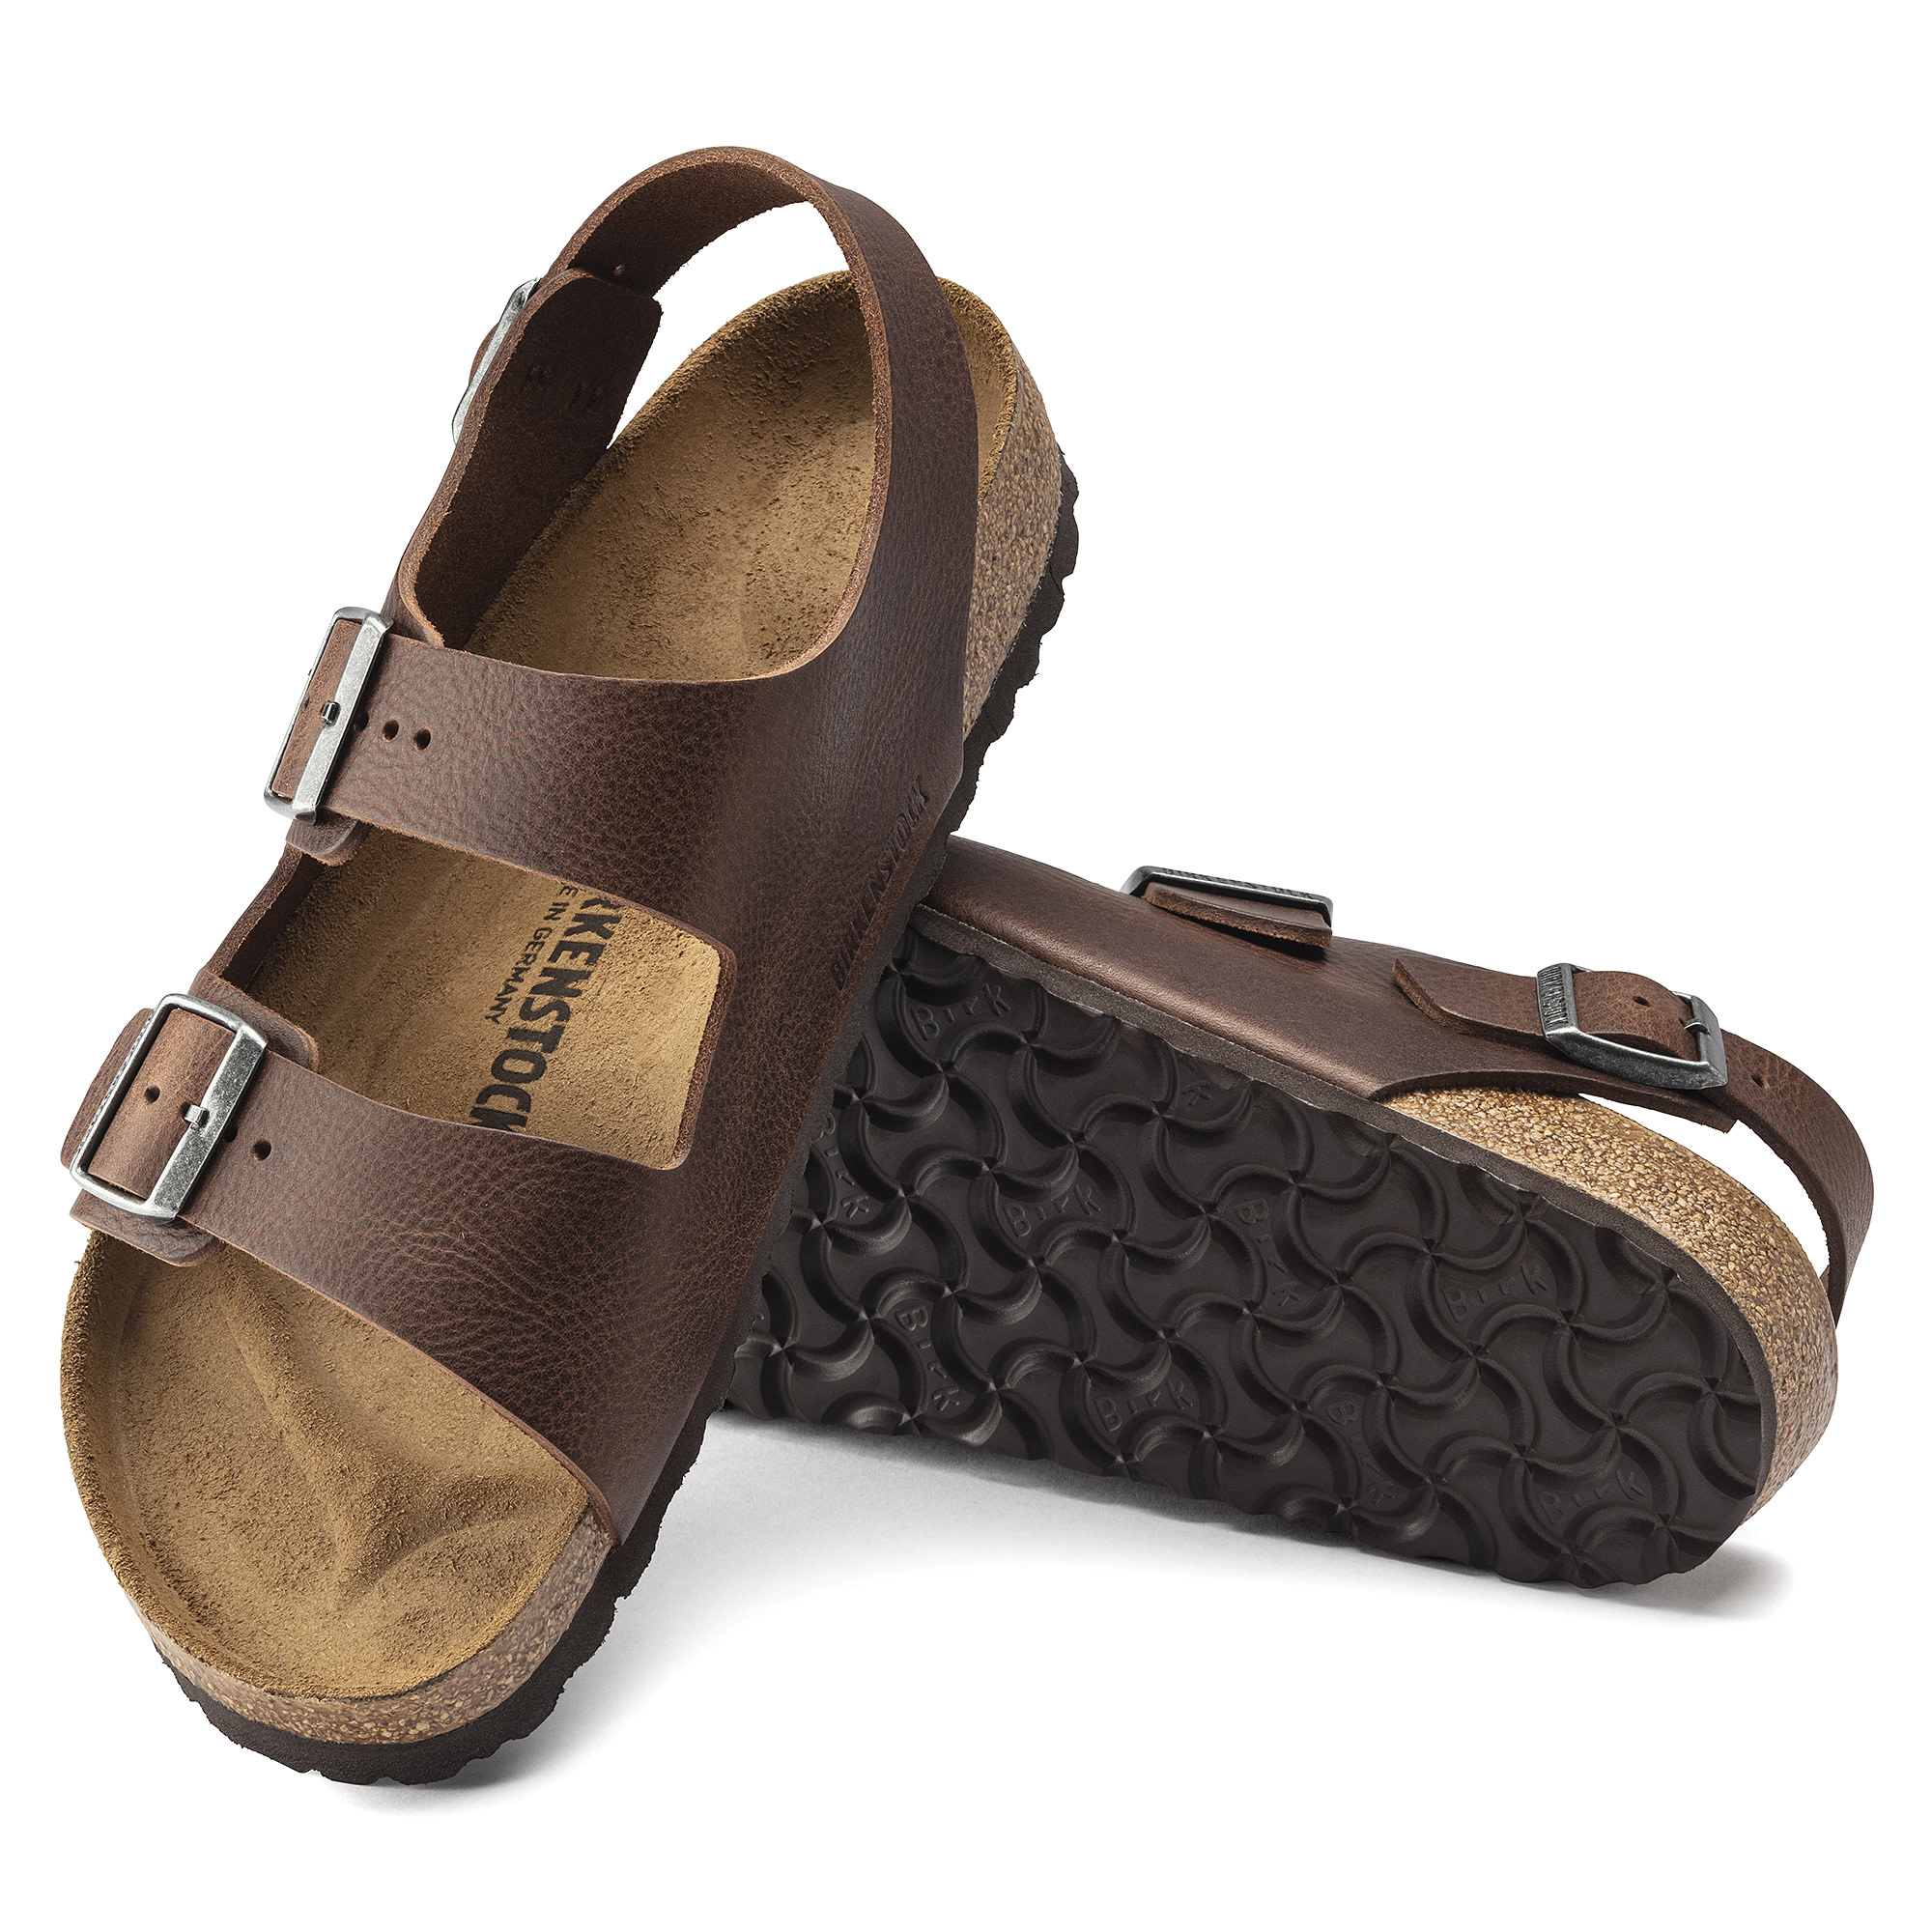 Birkenstock Birkenstock Milano  Leather (Hommes - Régulier) - Vintage Roast